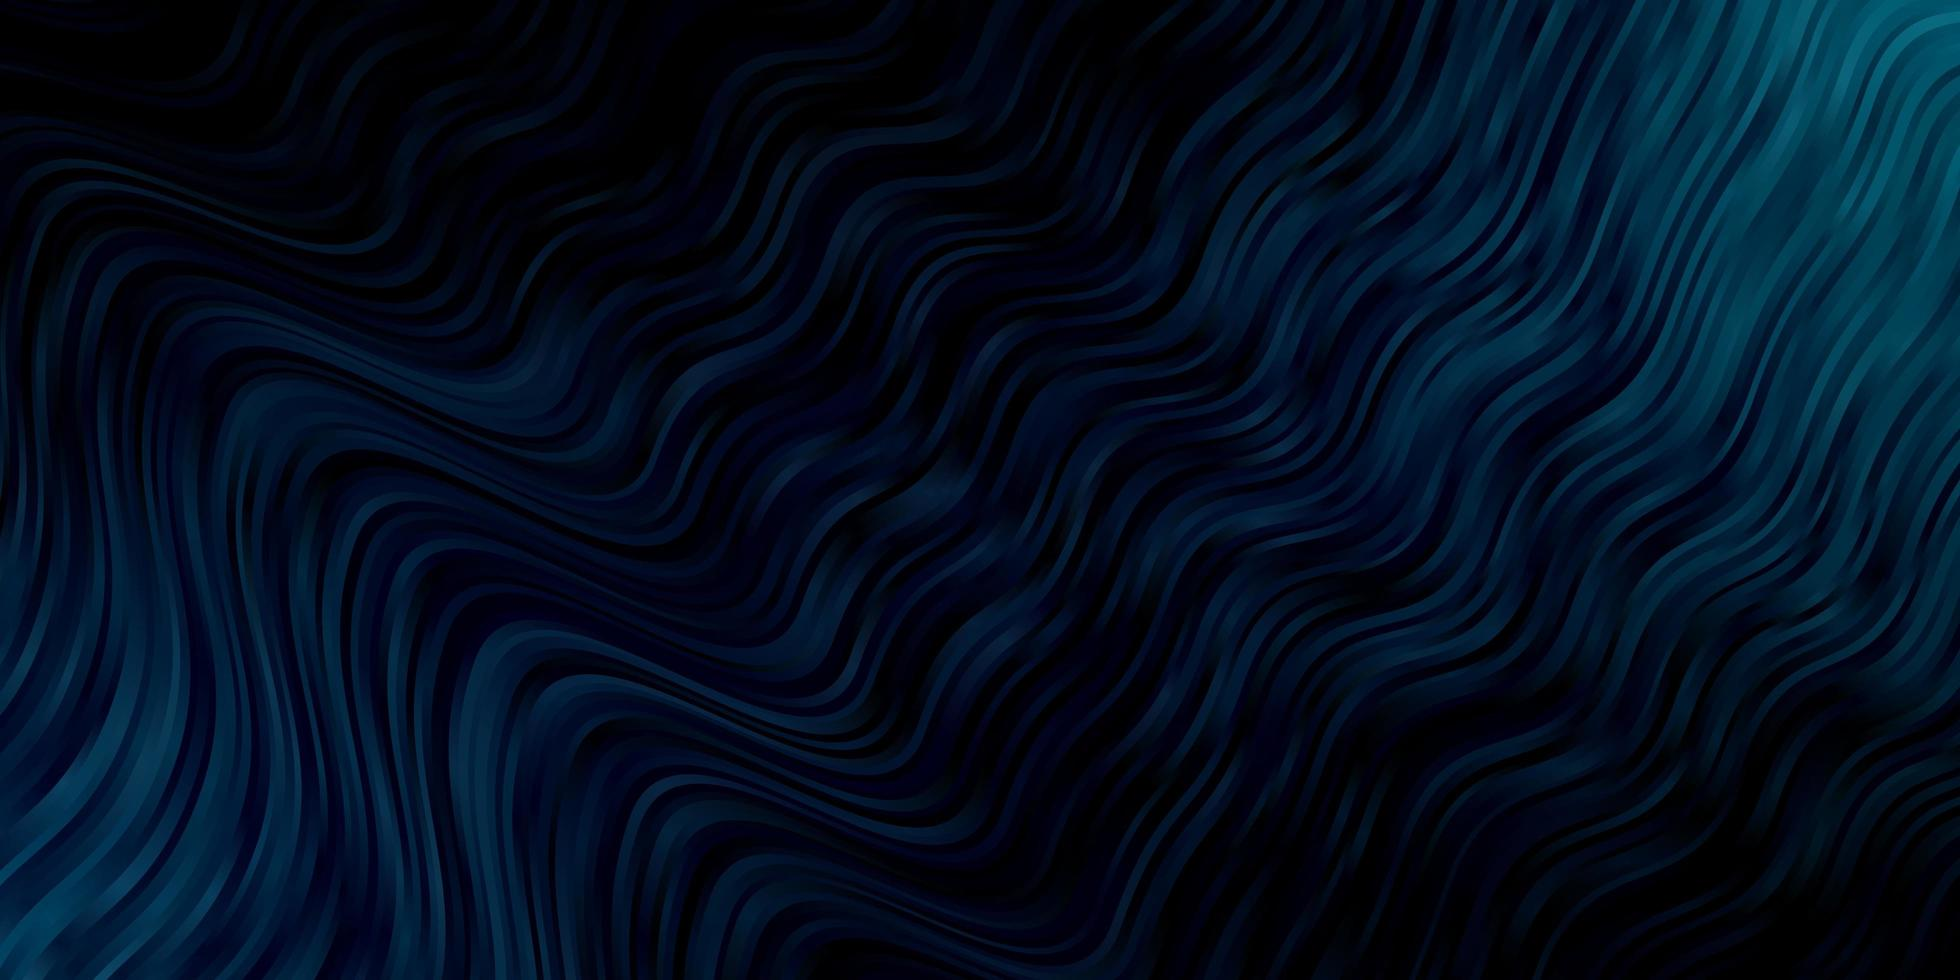 textura azul escura com curvas. vetor